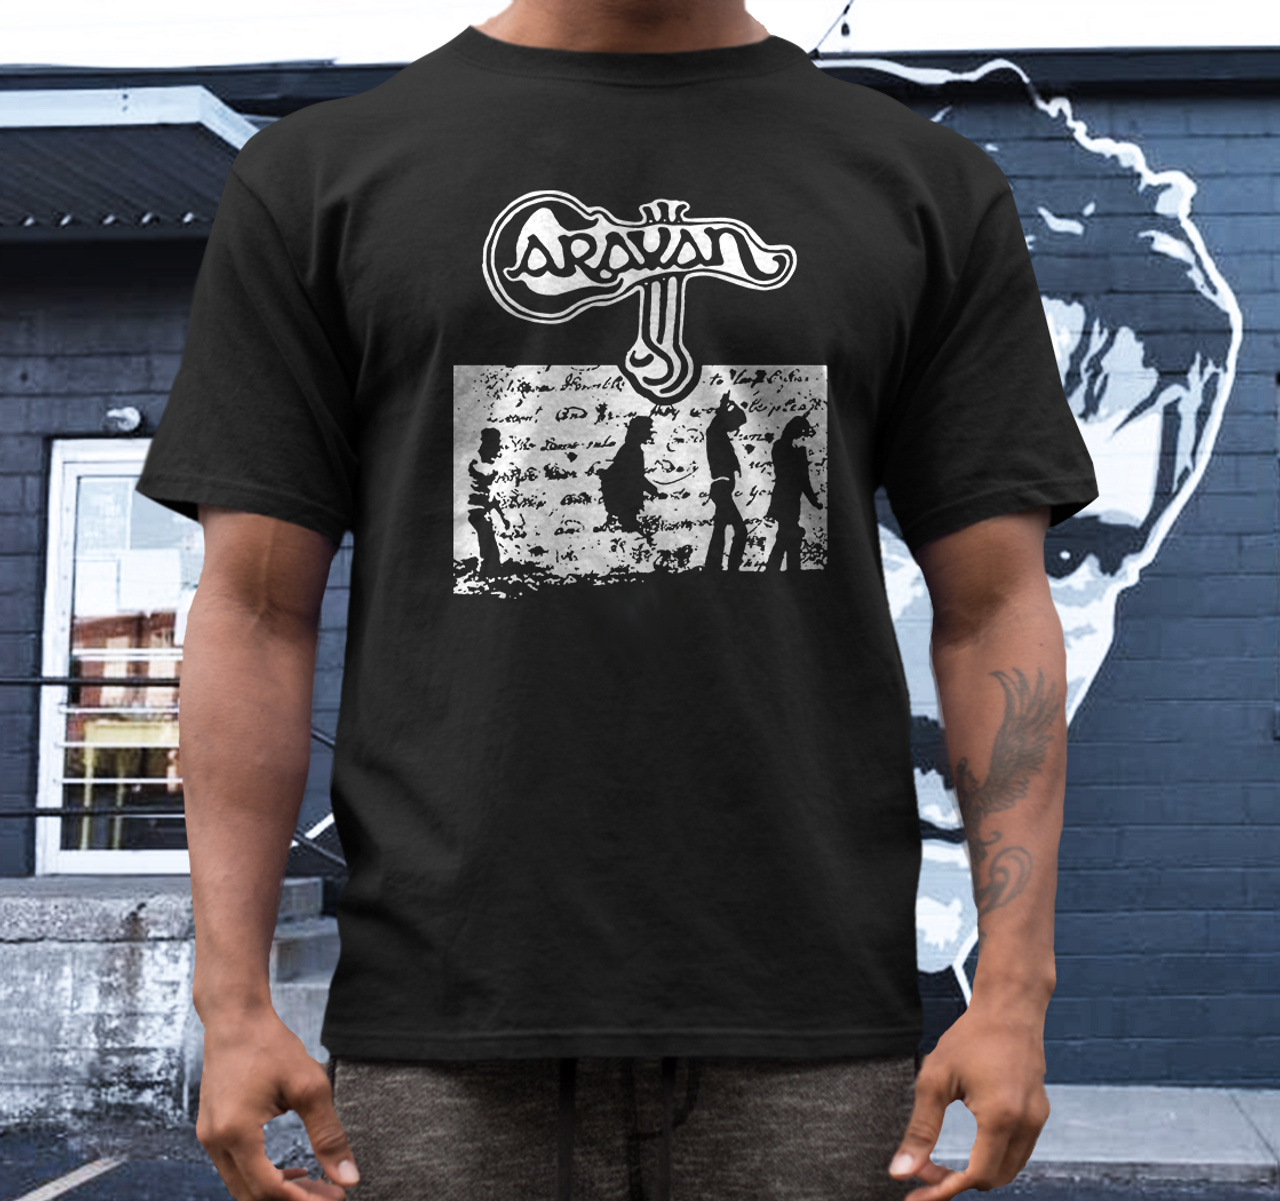 caravan band t shirt